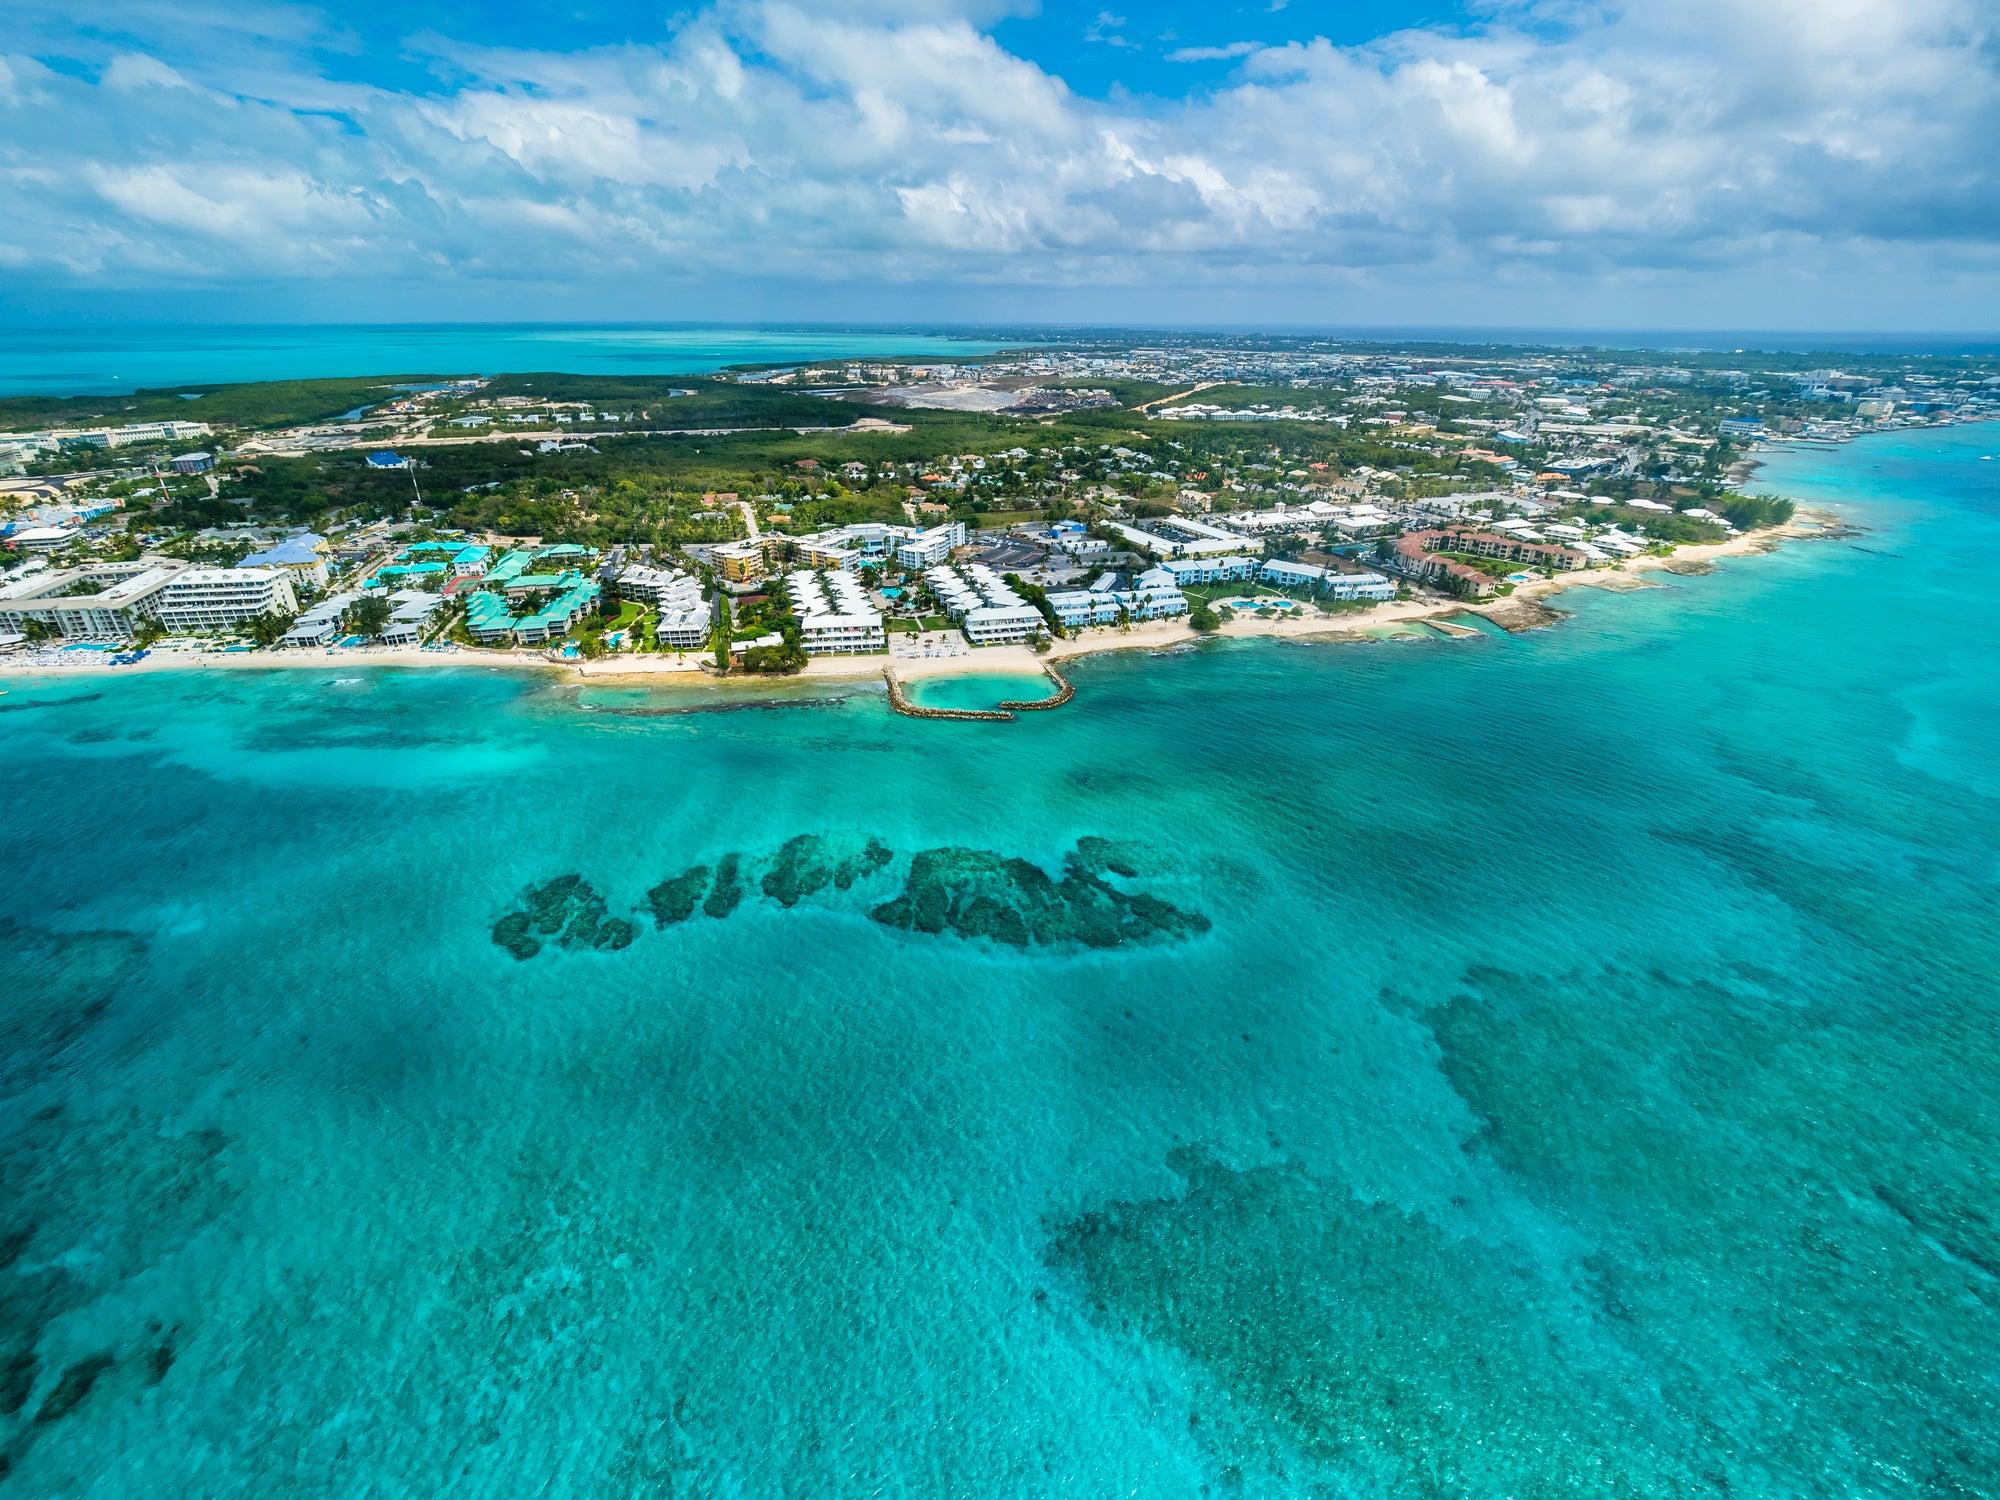 The 10 best secret beaches in the Caribbean